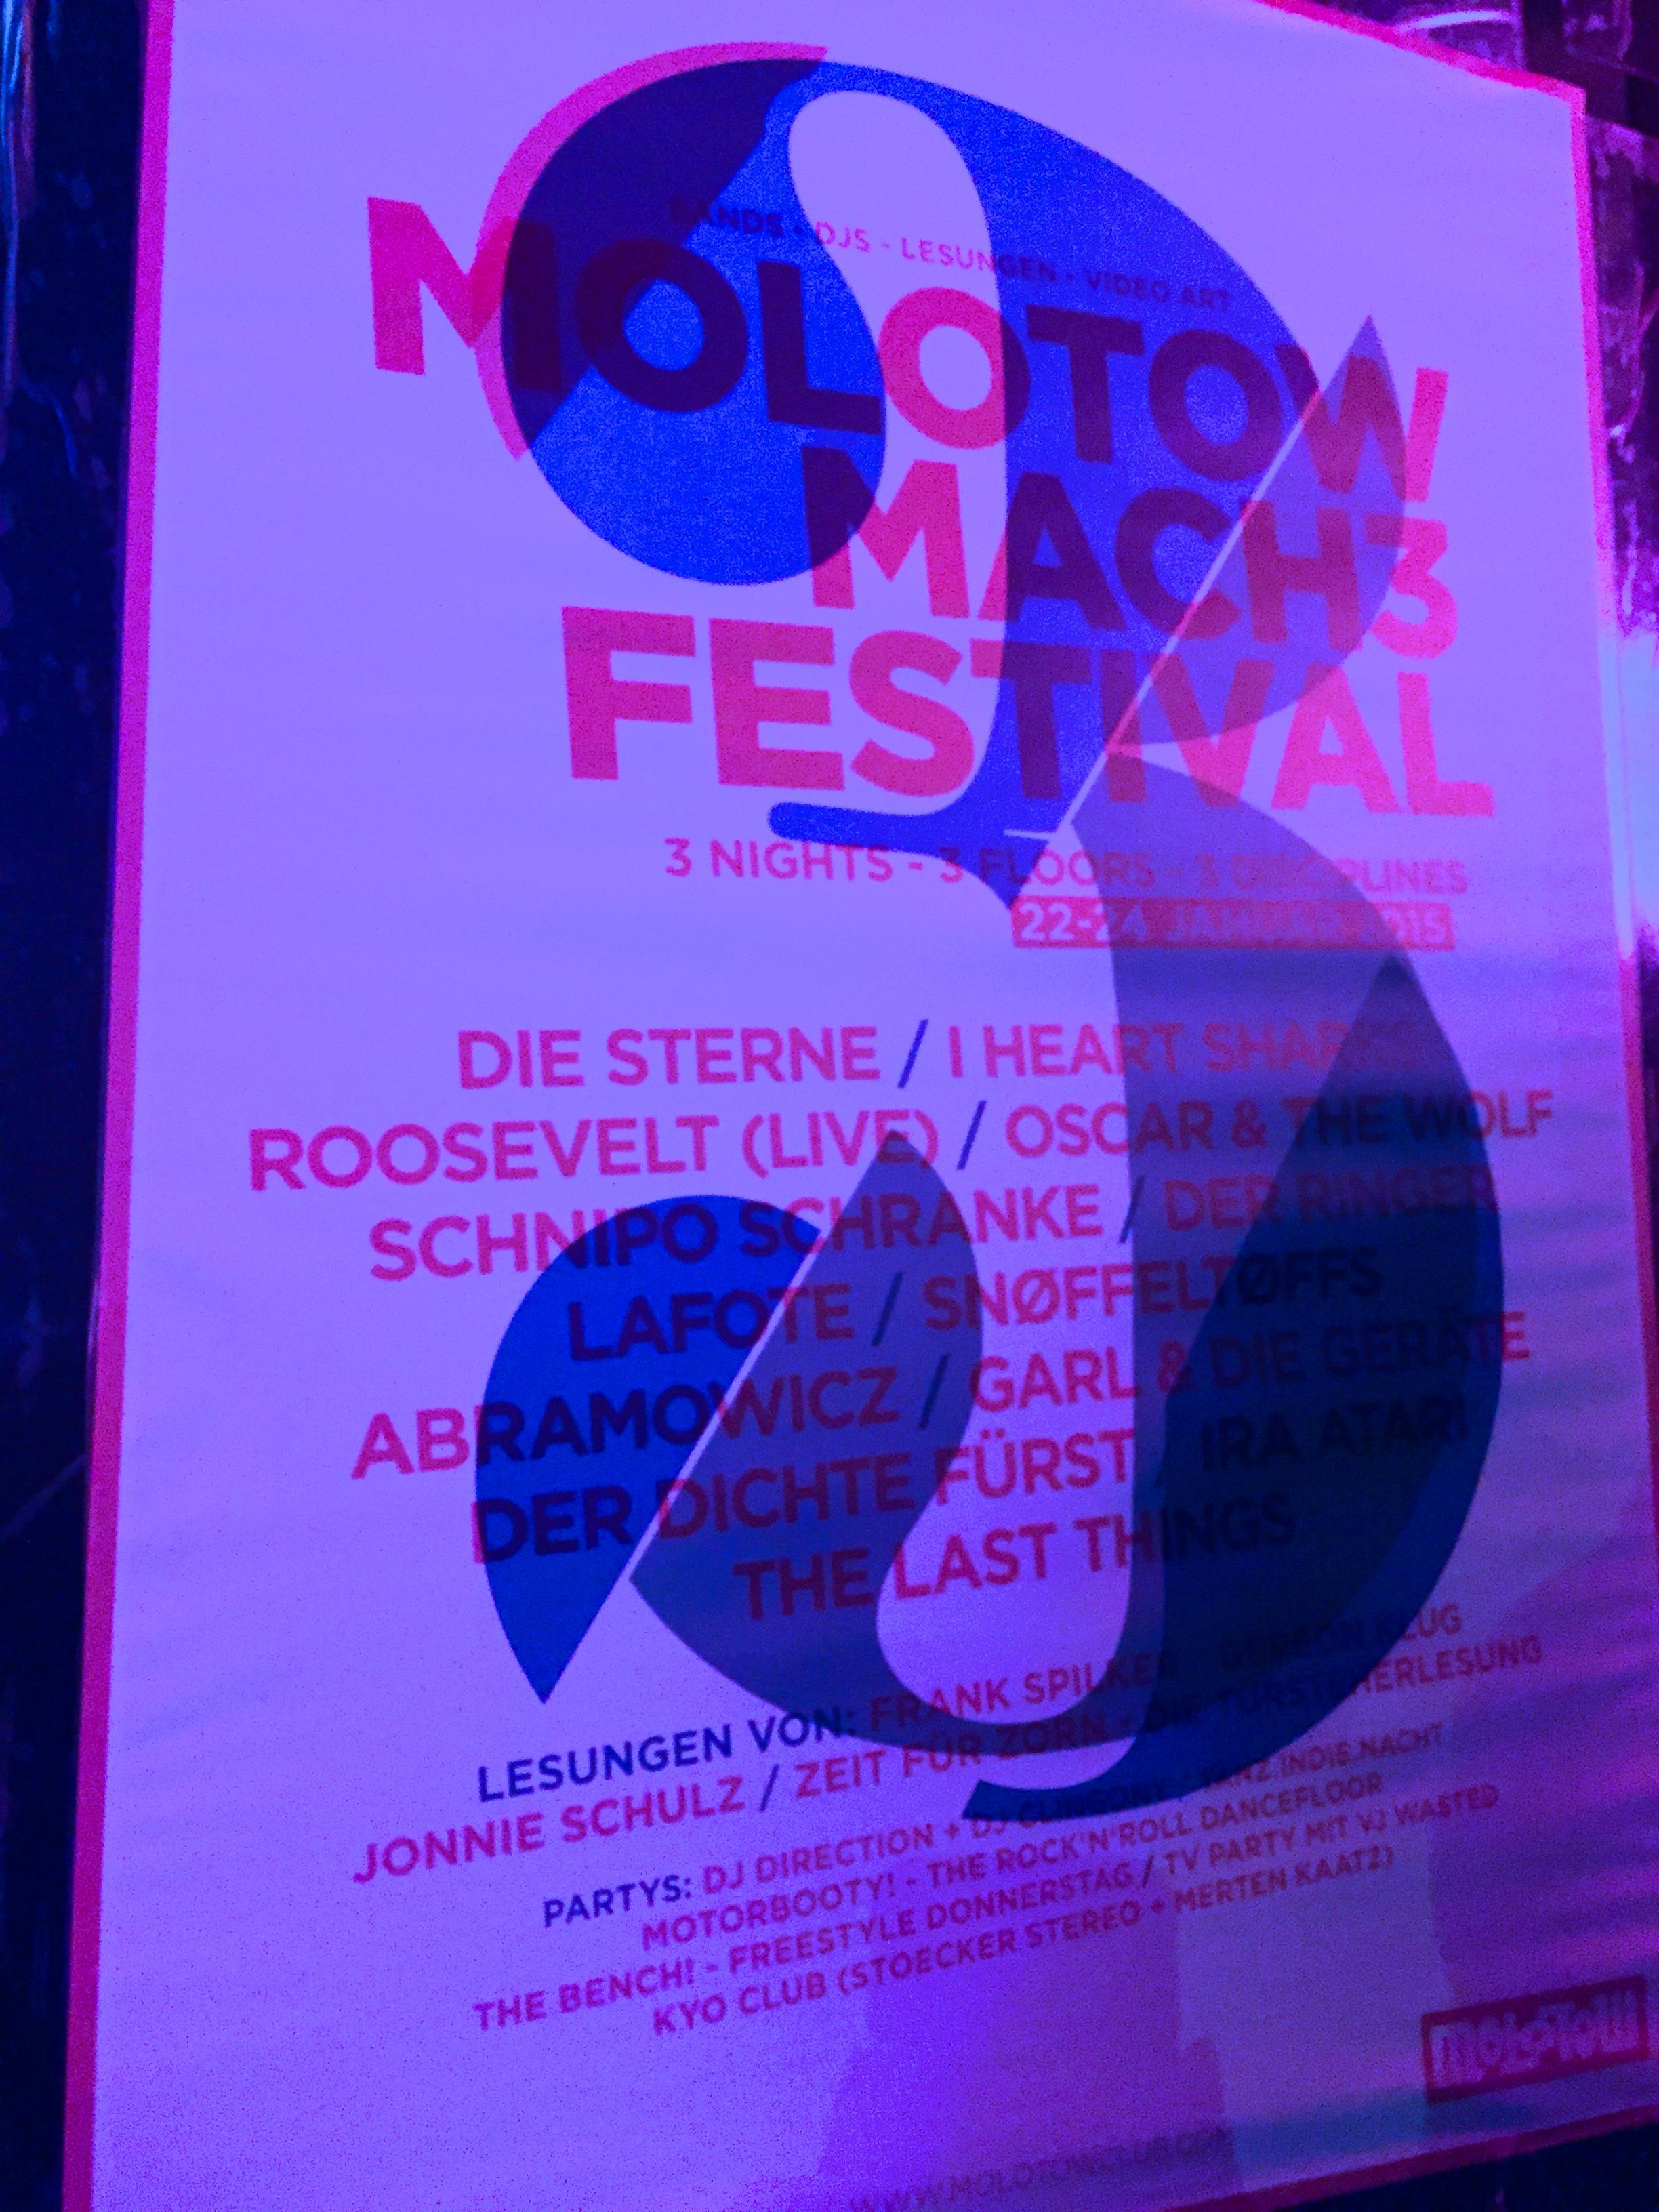 Mach 3 Festival Molotow Hamburg 2015